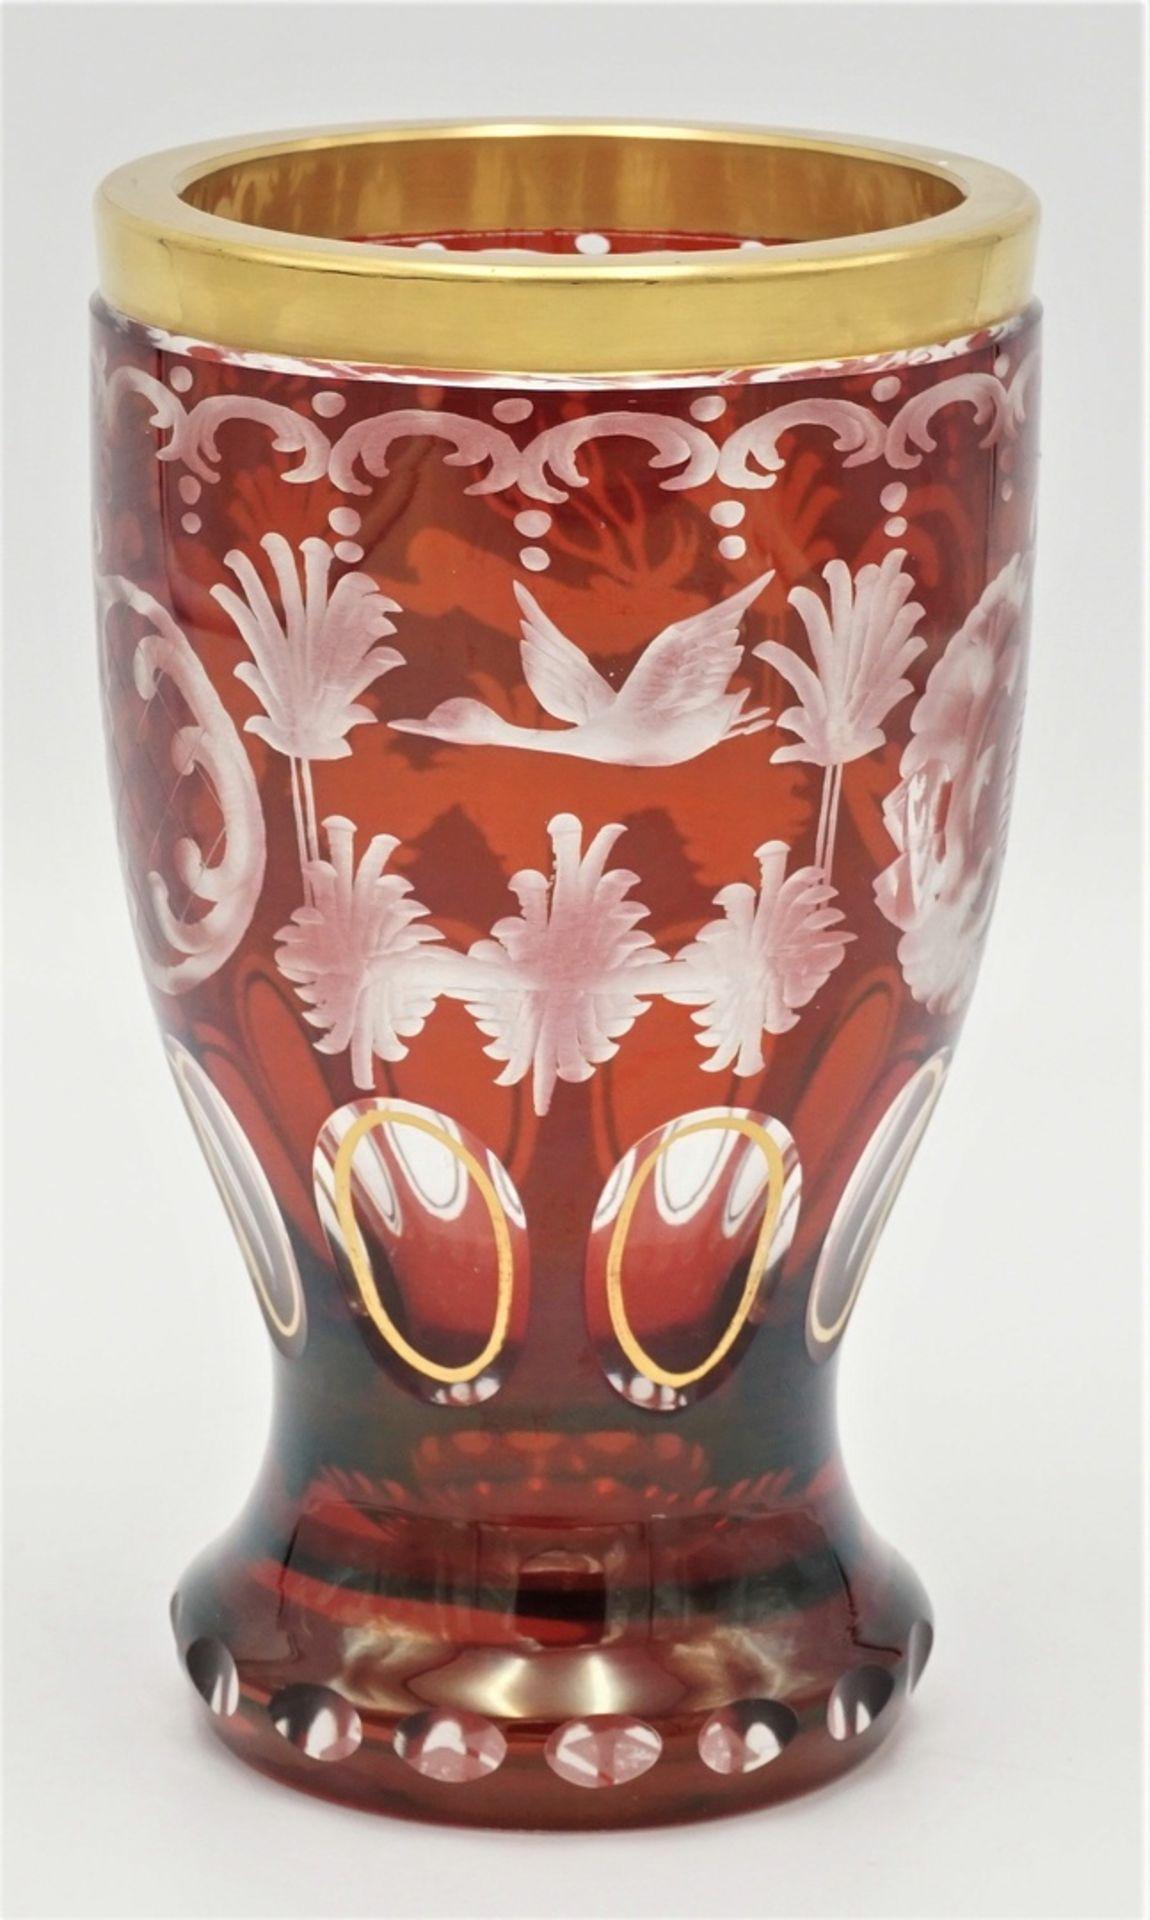 Böhmen Becherglas - Bild 2 aus 3